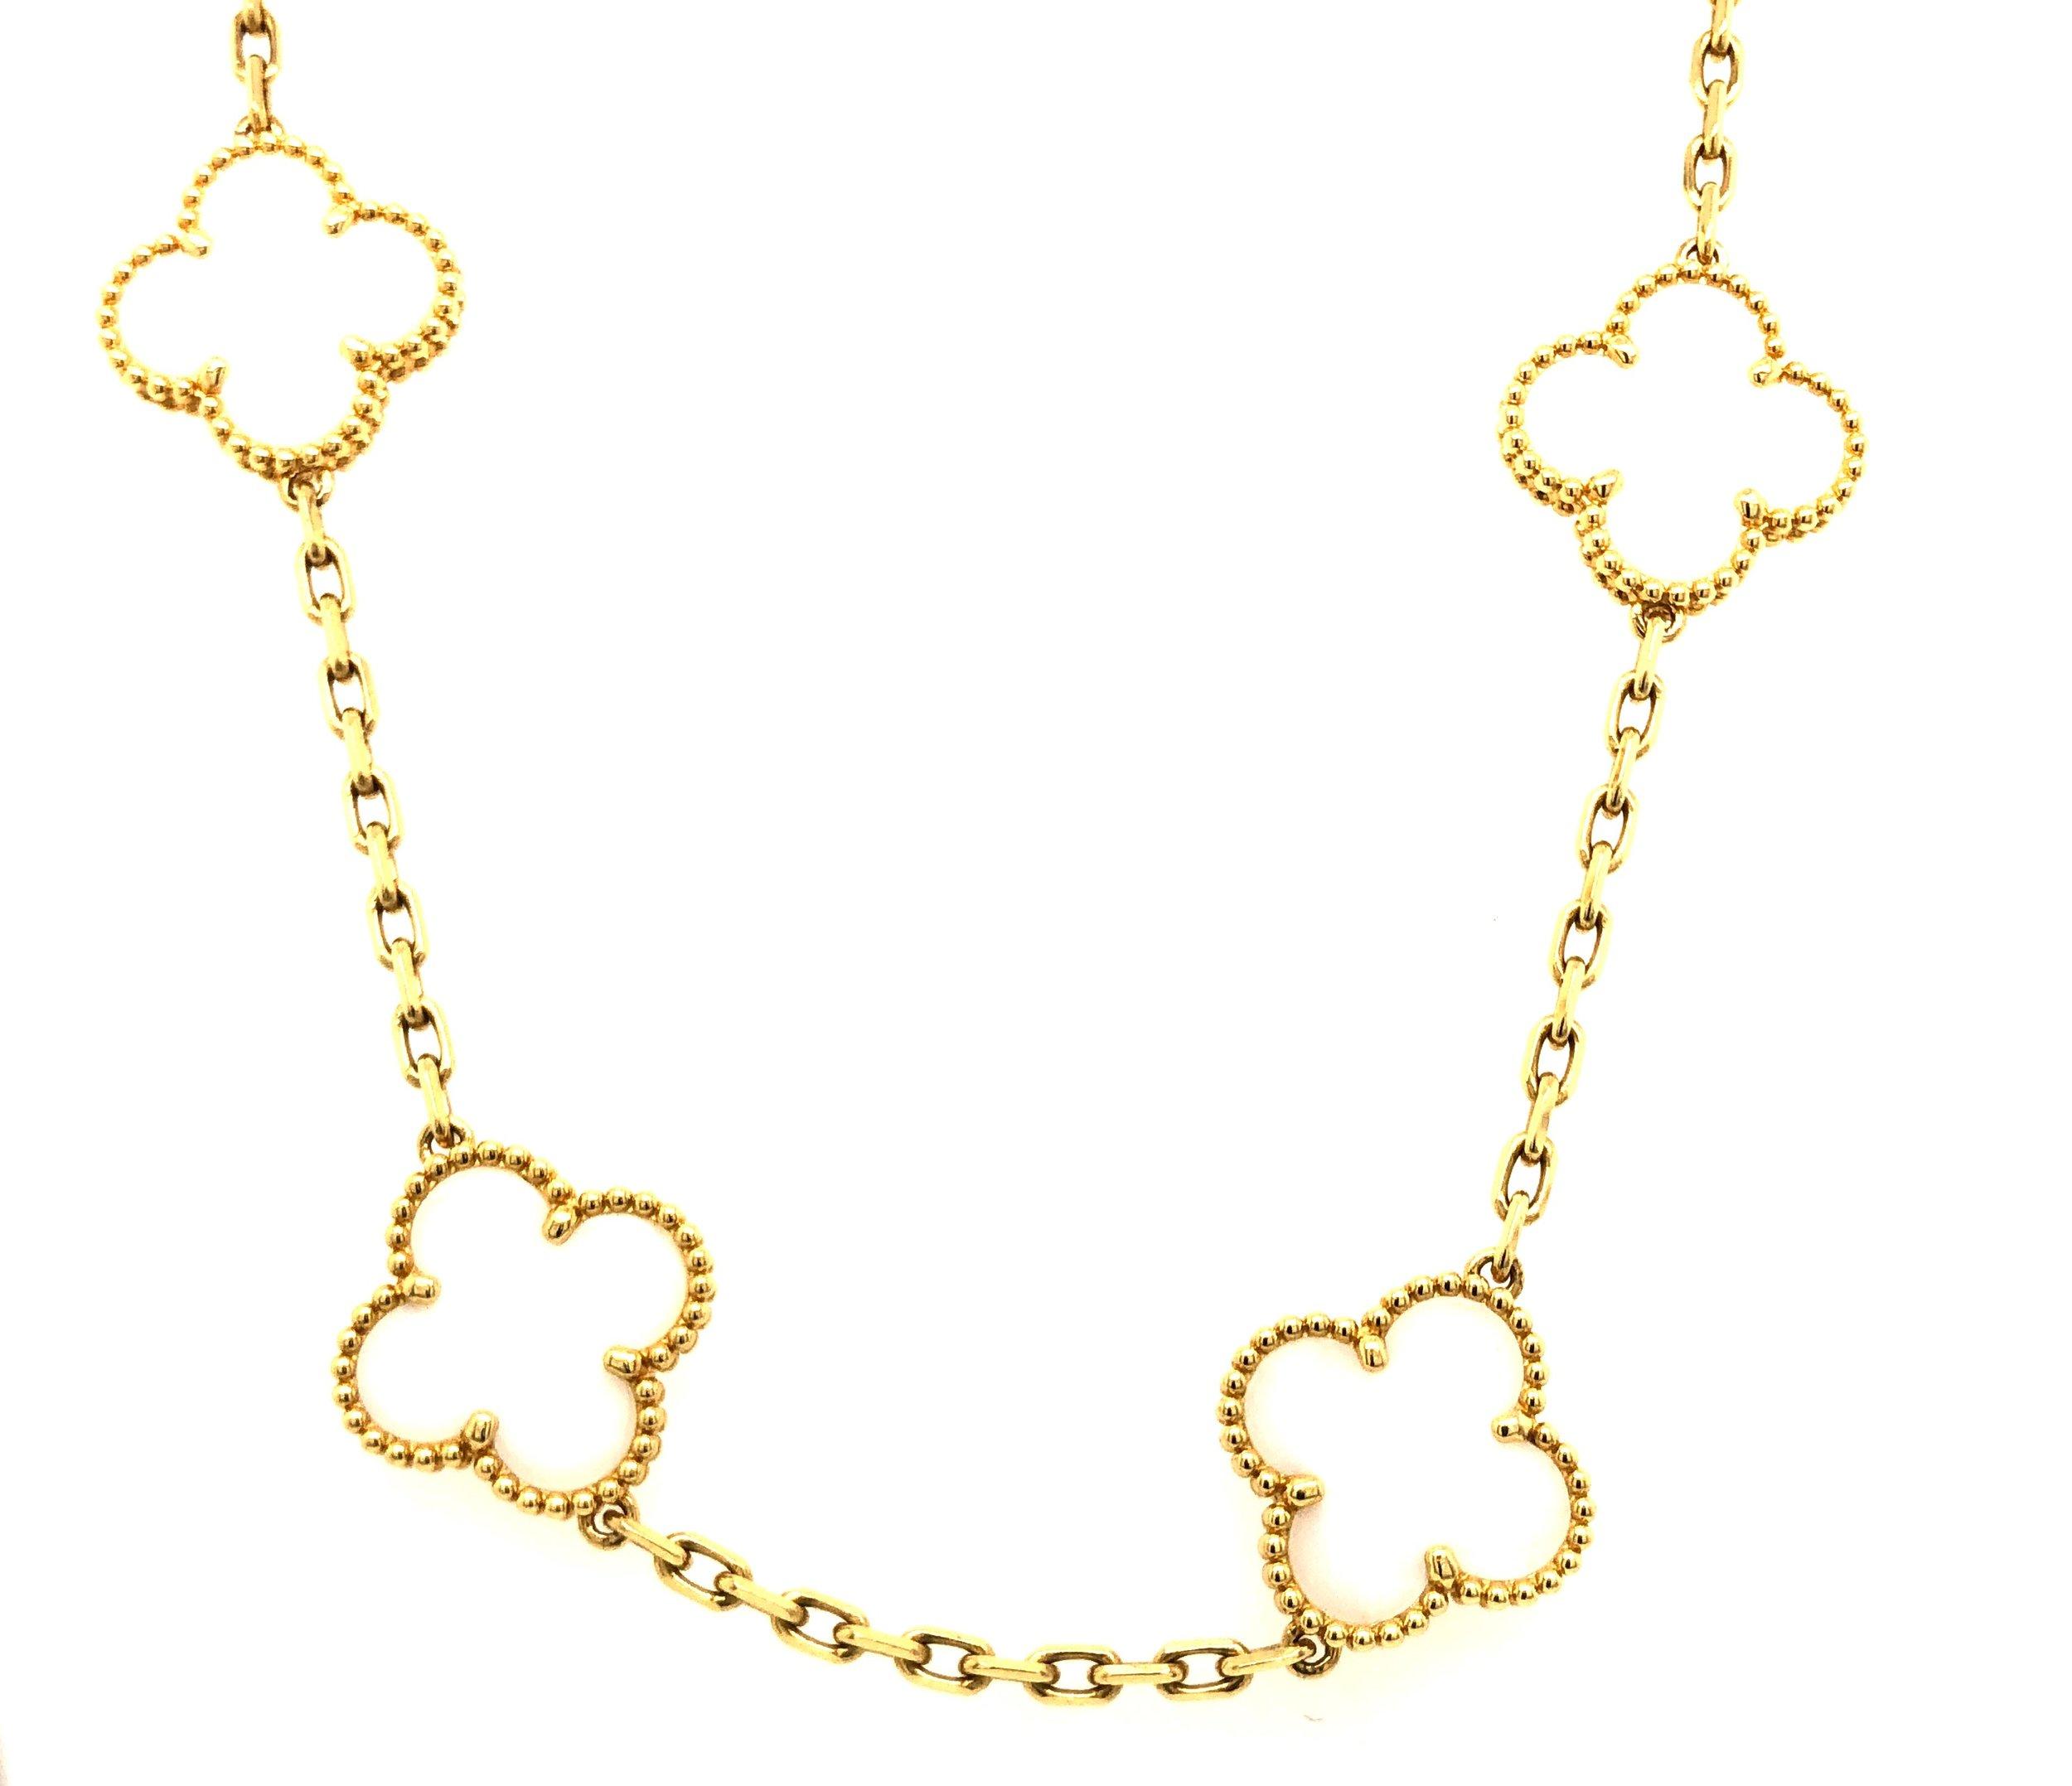 Alahambra 20 Motif White Coral Necklace, 18kt Yellow Gold,  Van Cleef & Arpels,  Circa 1970  Est. US$ 30,000-35,000